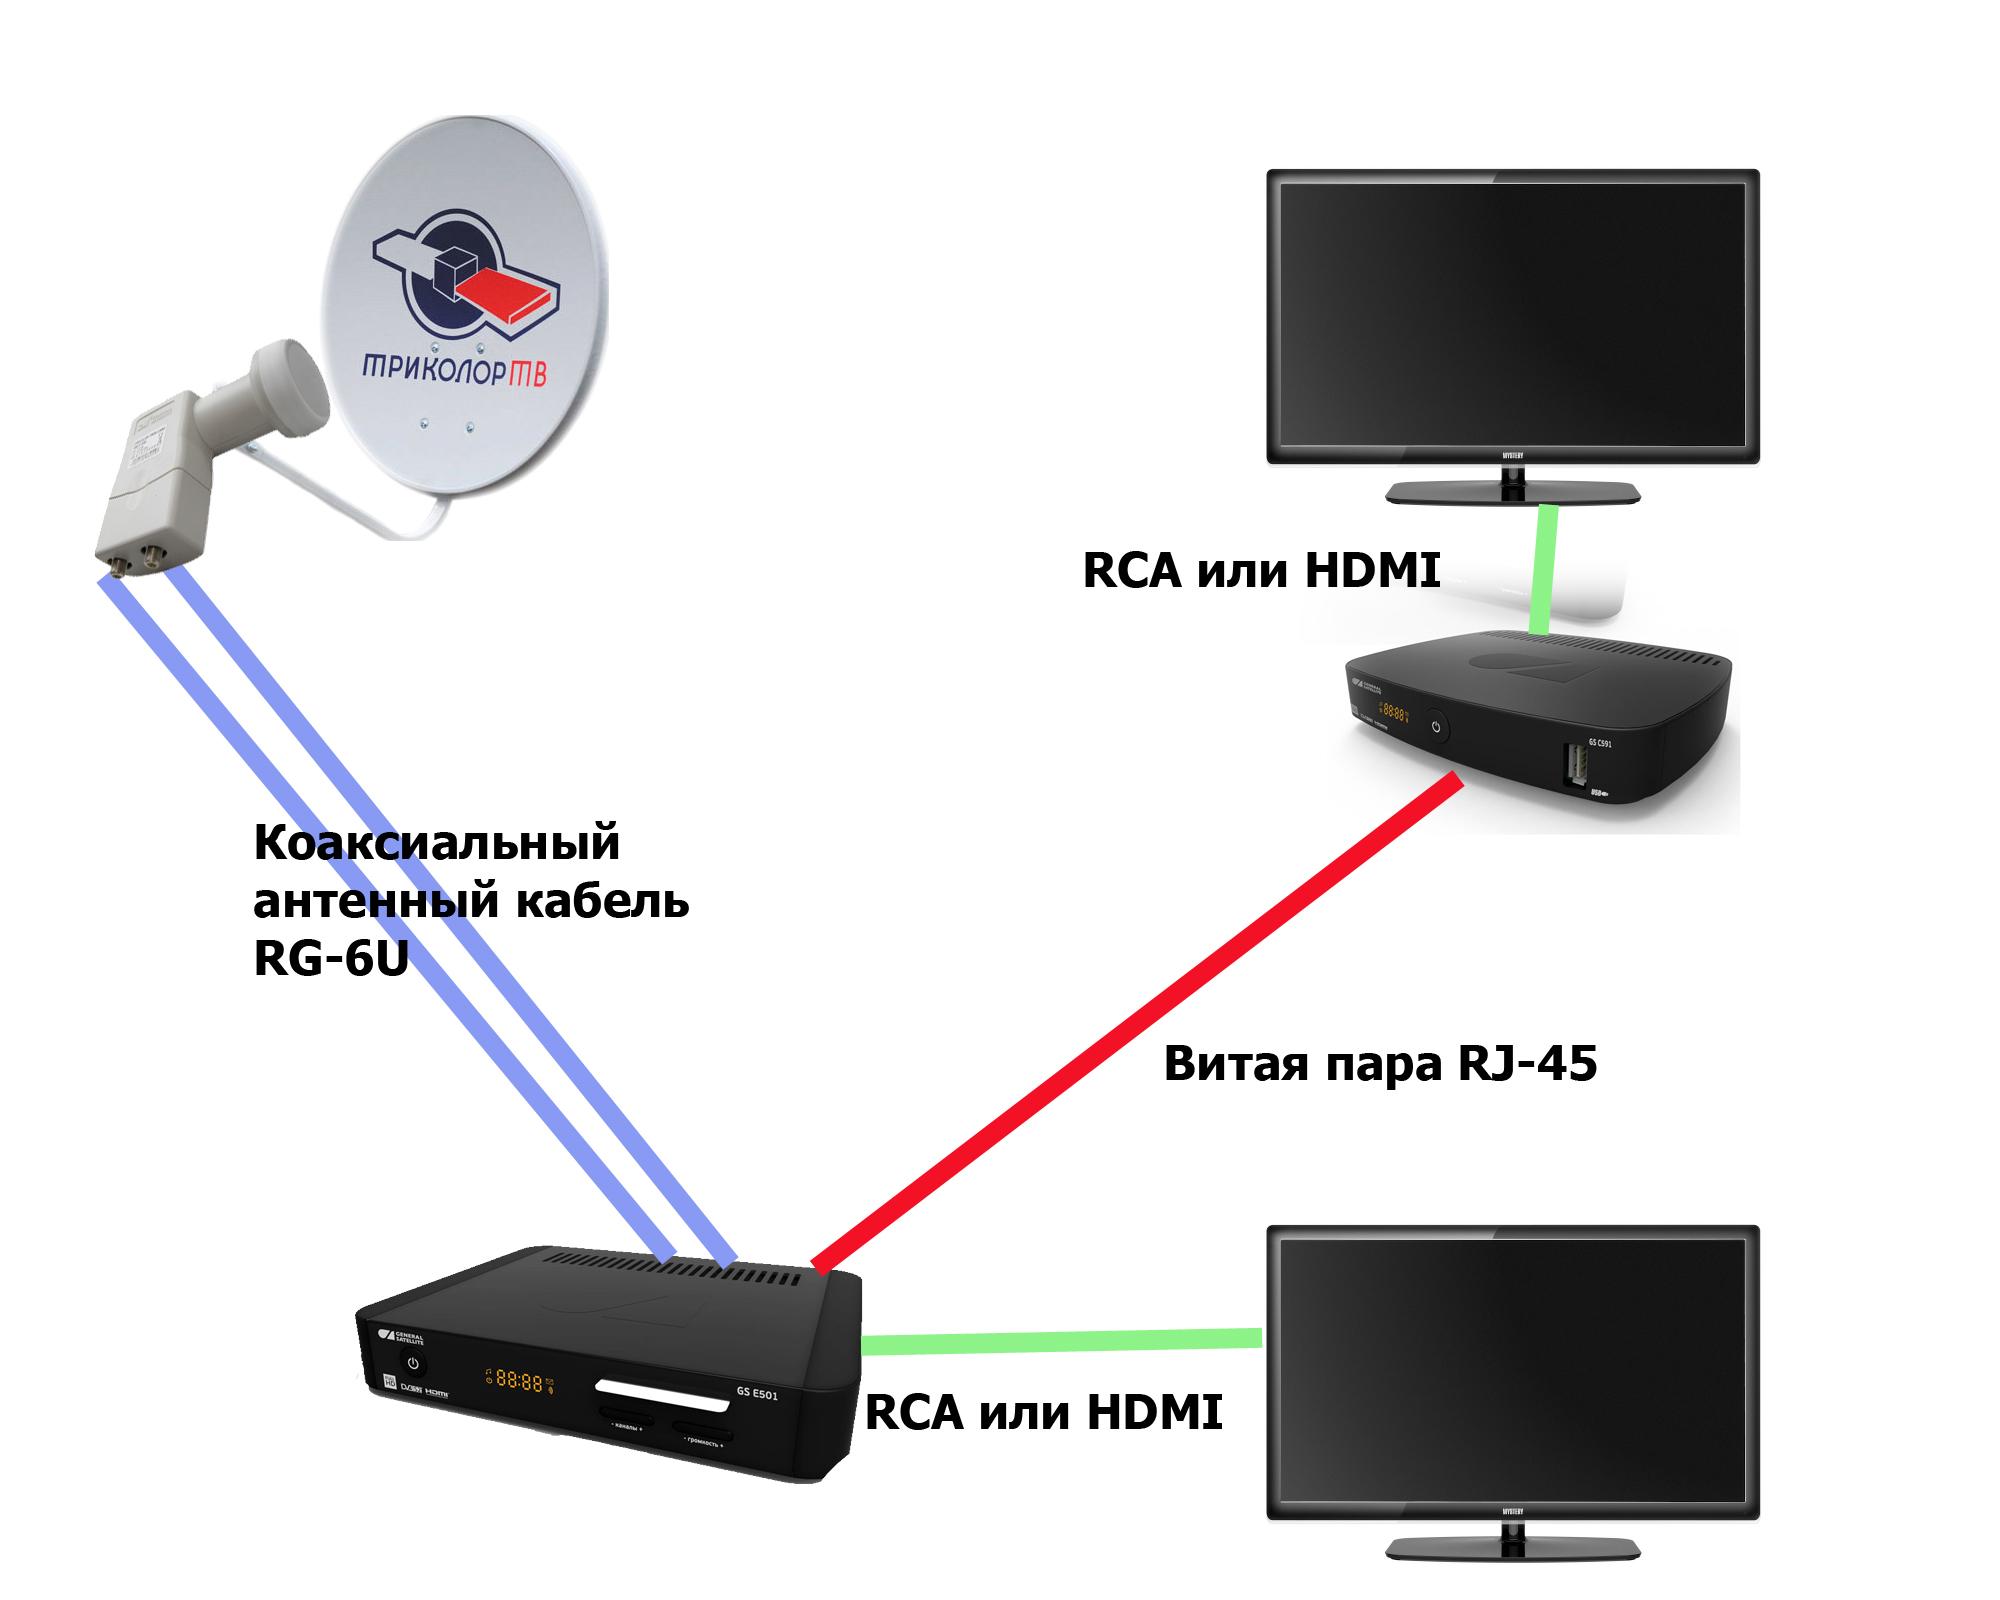 схема подключеният спу 9303